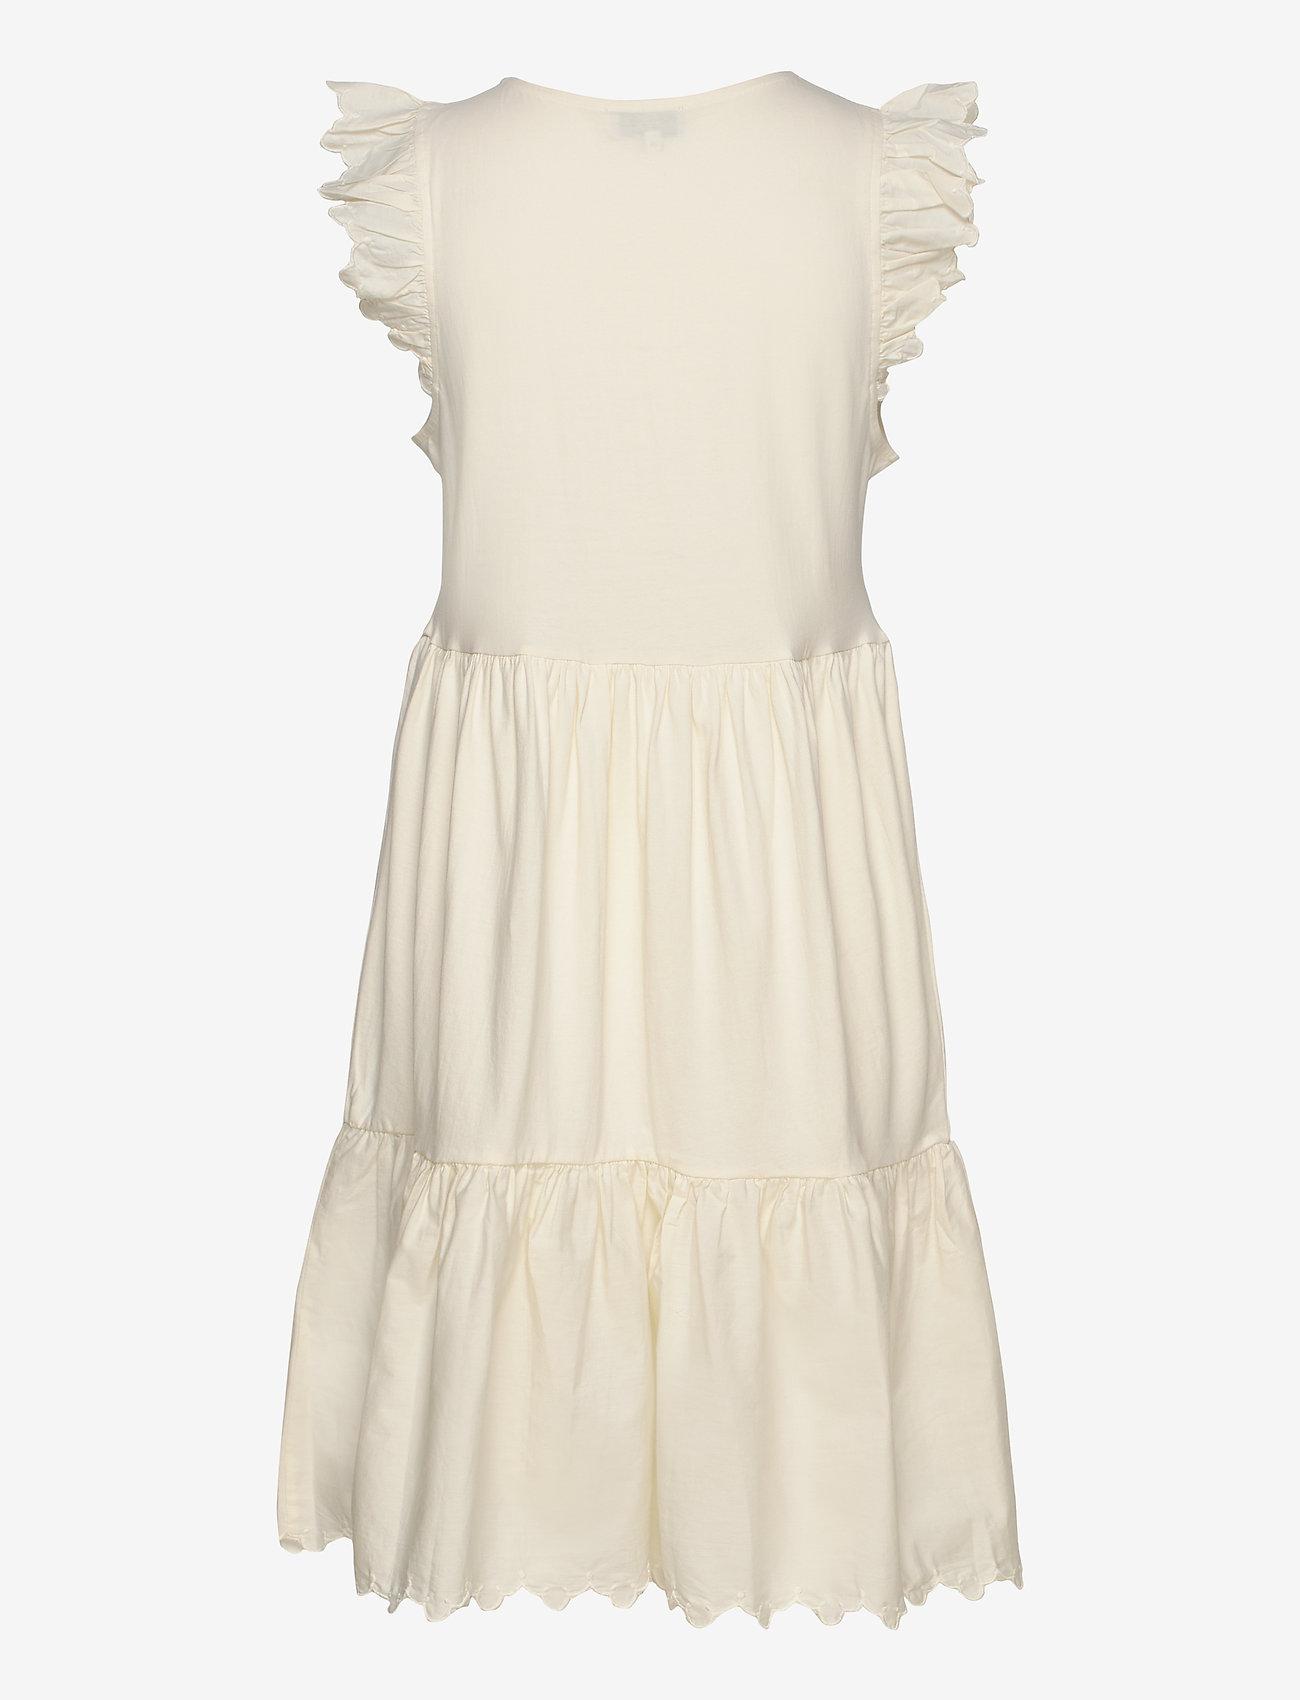 Dress Sleeveless (White Asparagus) (76.97 €) - Noa Noa 5fqvR